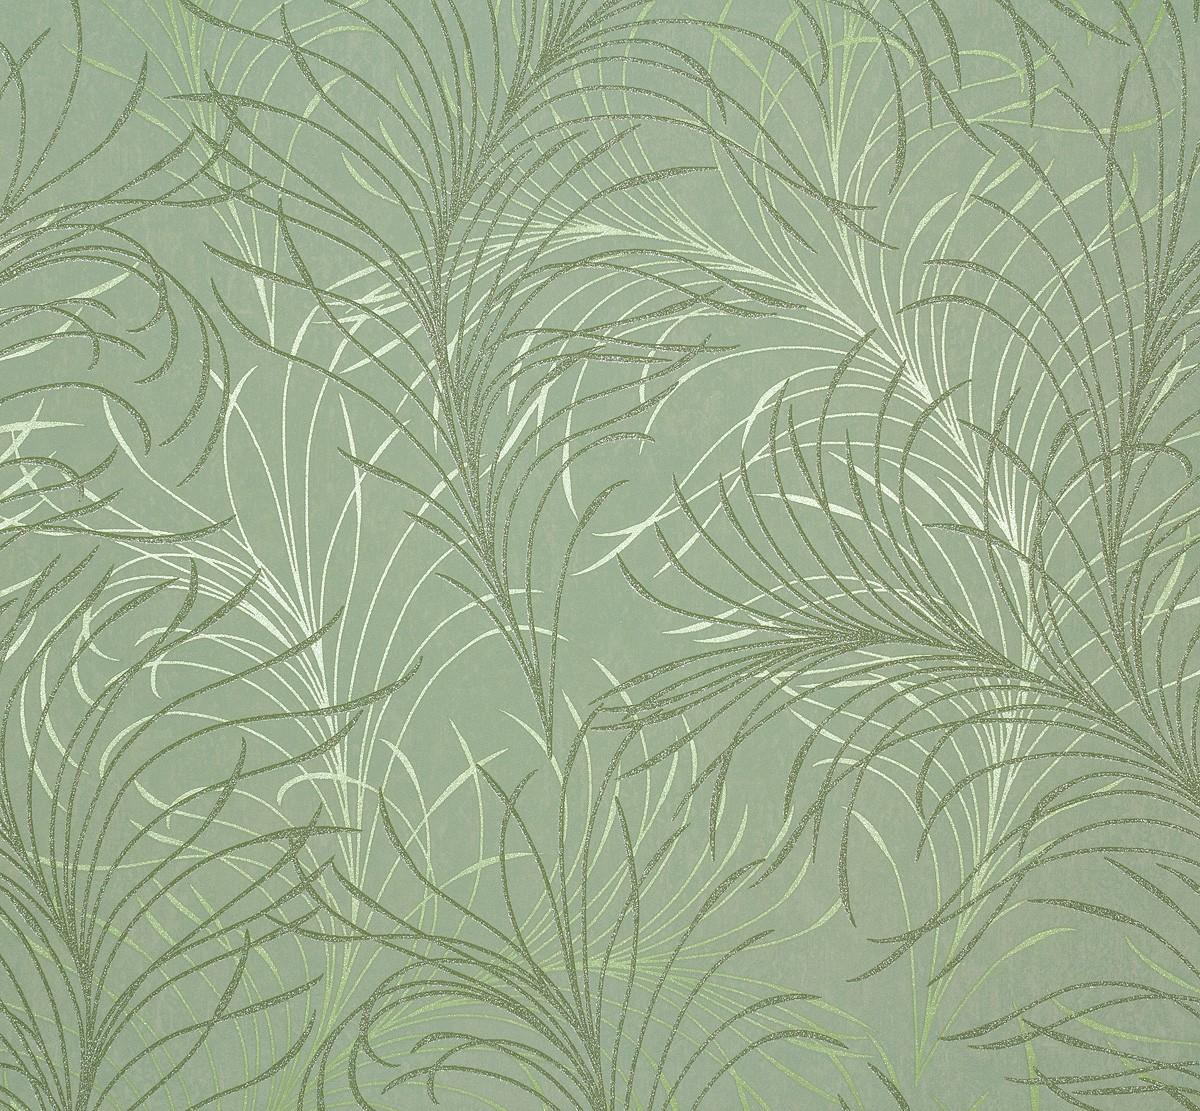 Vliestapete gr n beige natur estelle marburg 55714 for Marburg tapeten